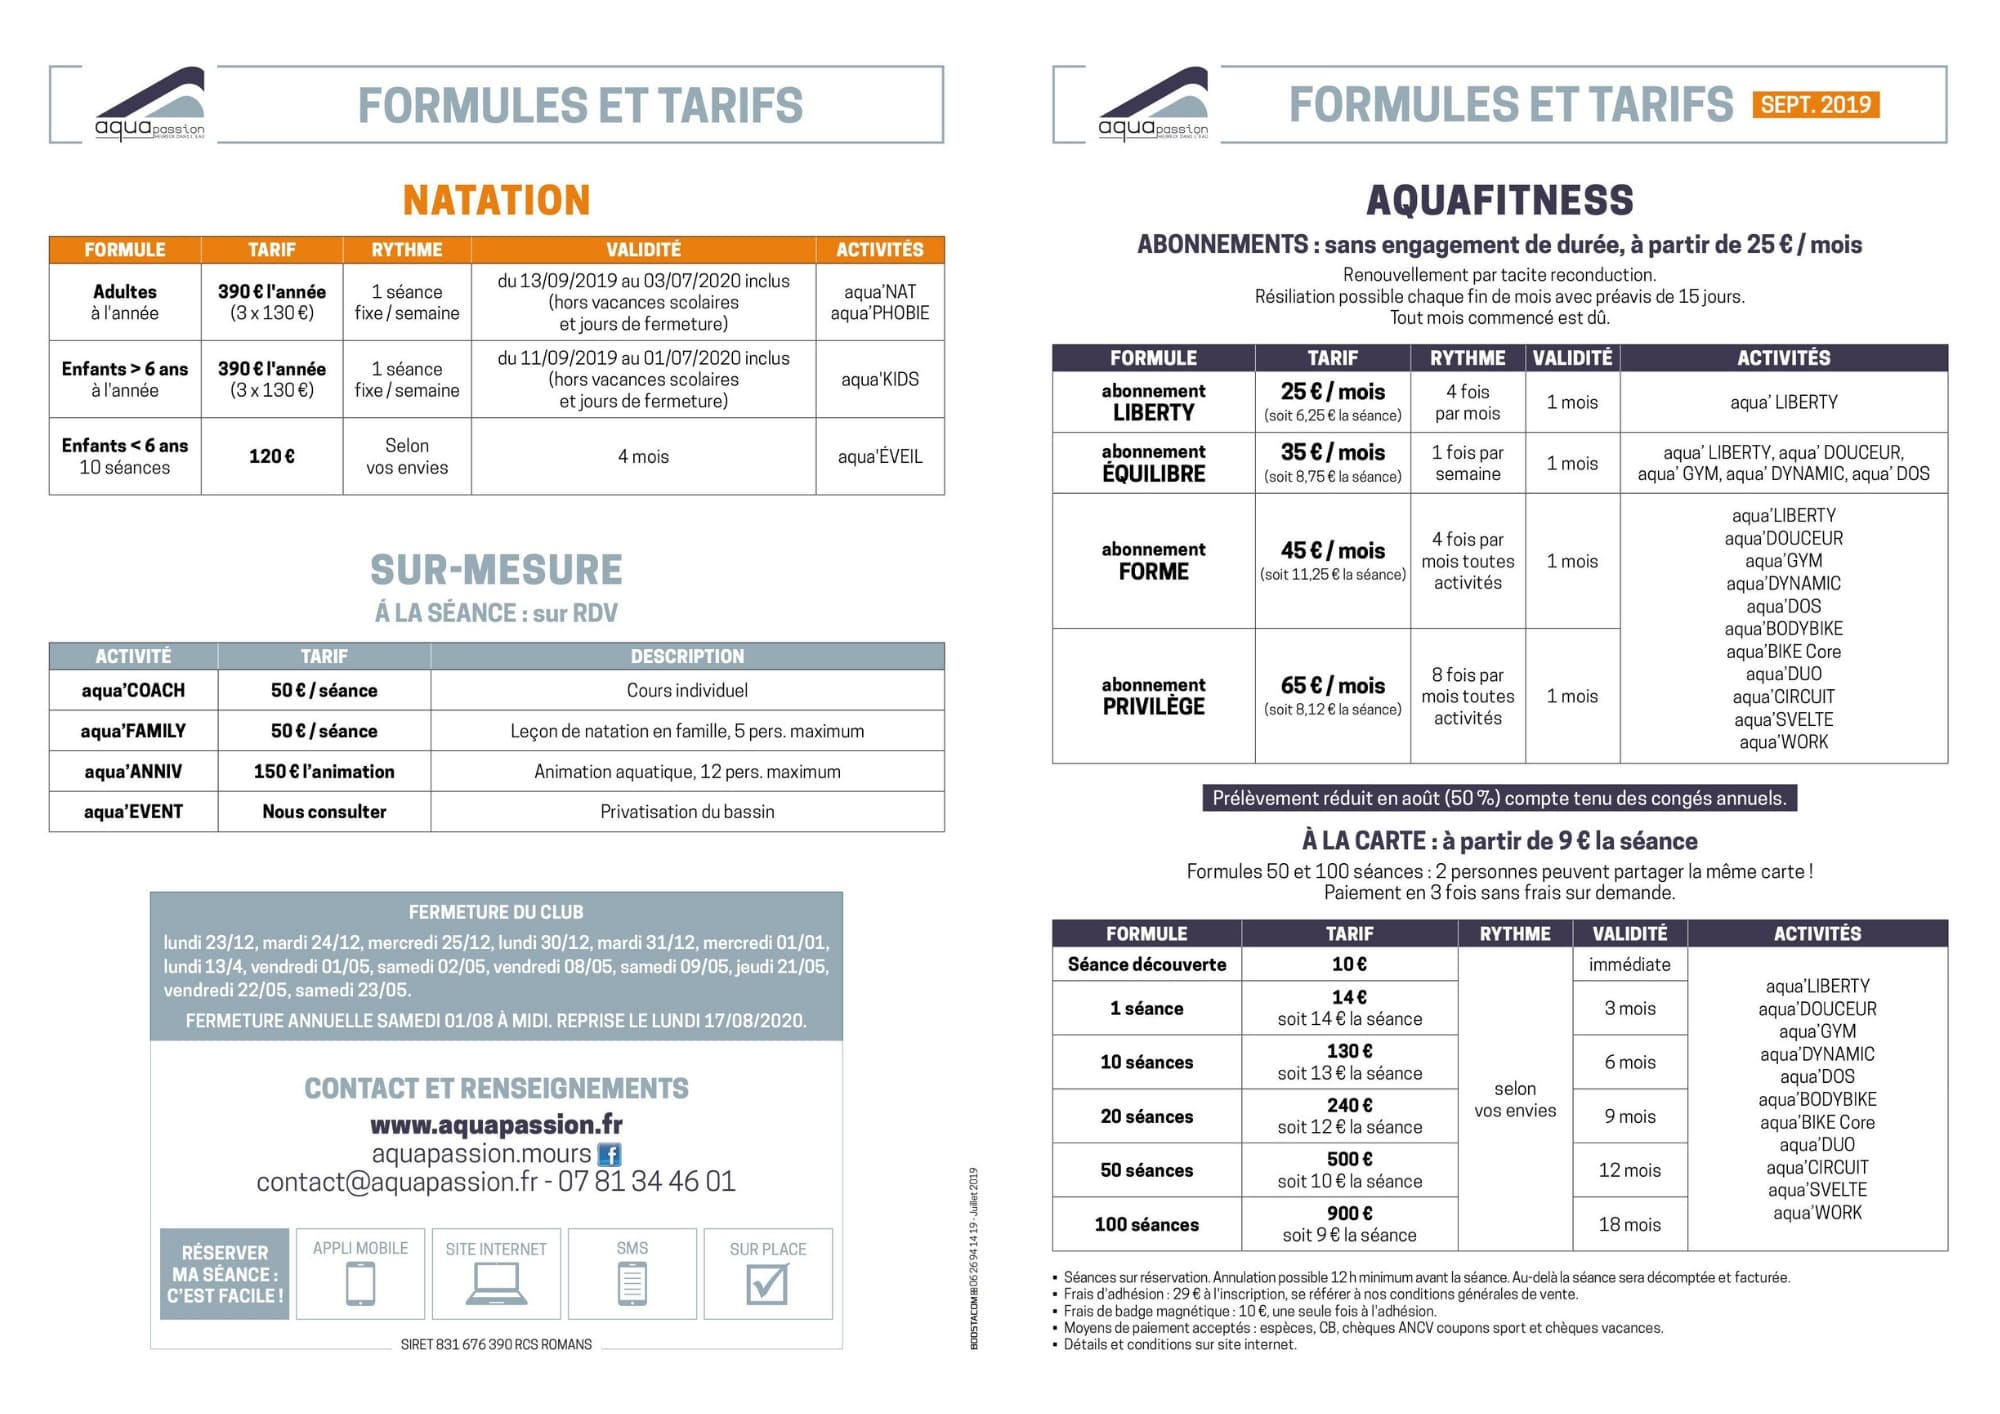 Formules et tarifs du centre aquatique Aquapassion